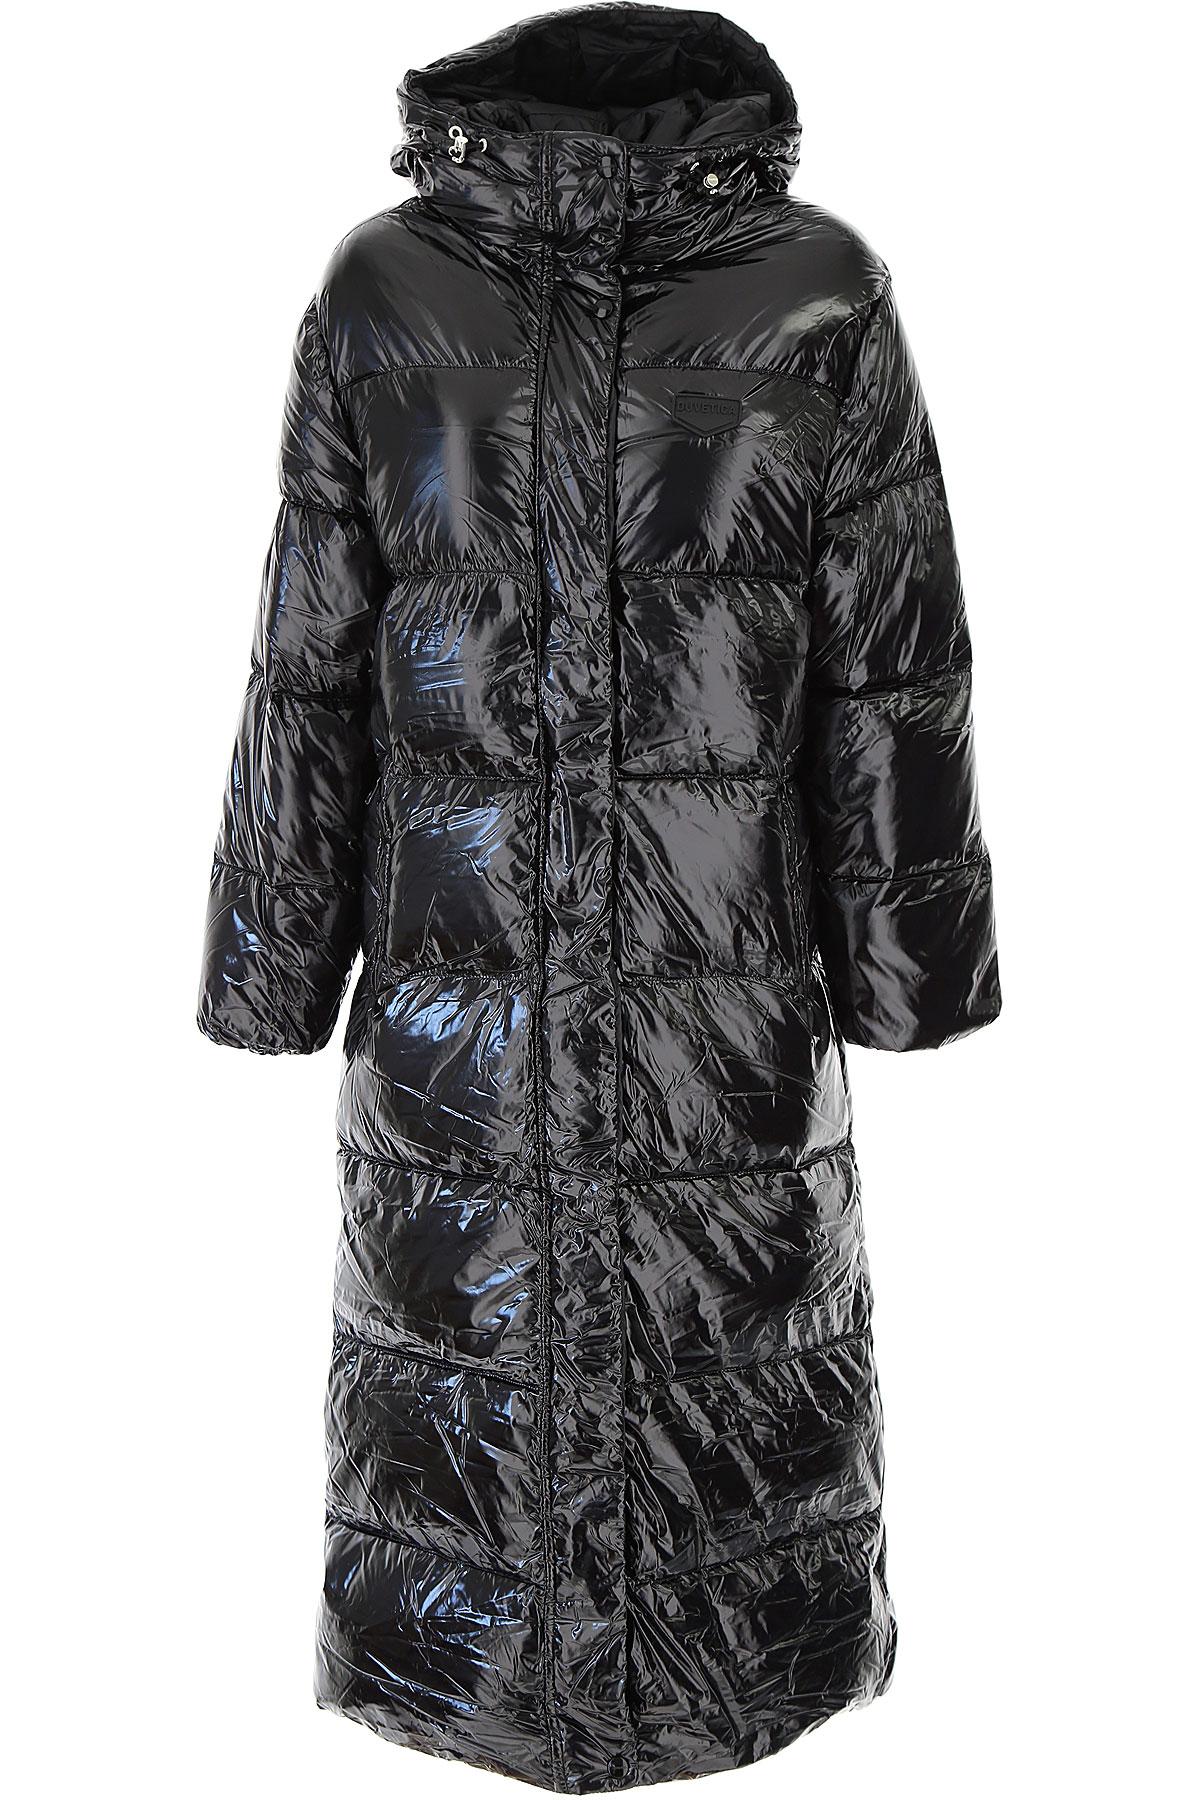 Duvetica Down Jacket for Women, Puffer Ski Jacket On Sale, Black, polyamide, 2019, 2 4 6